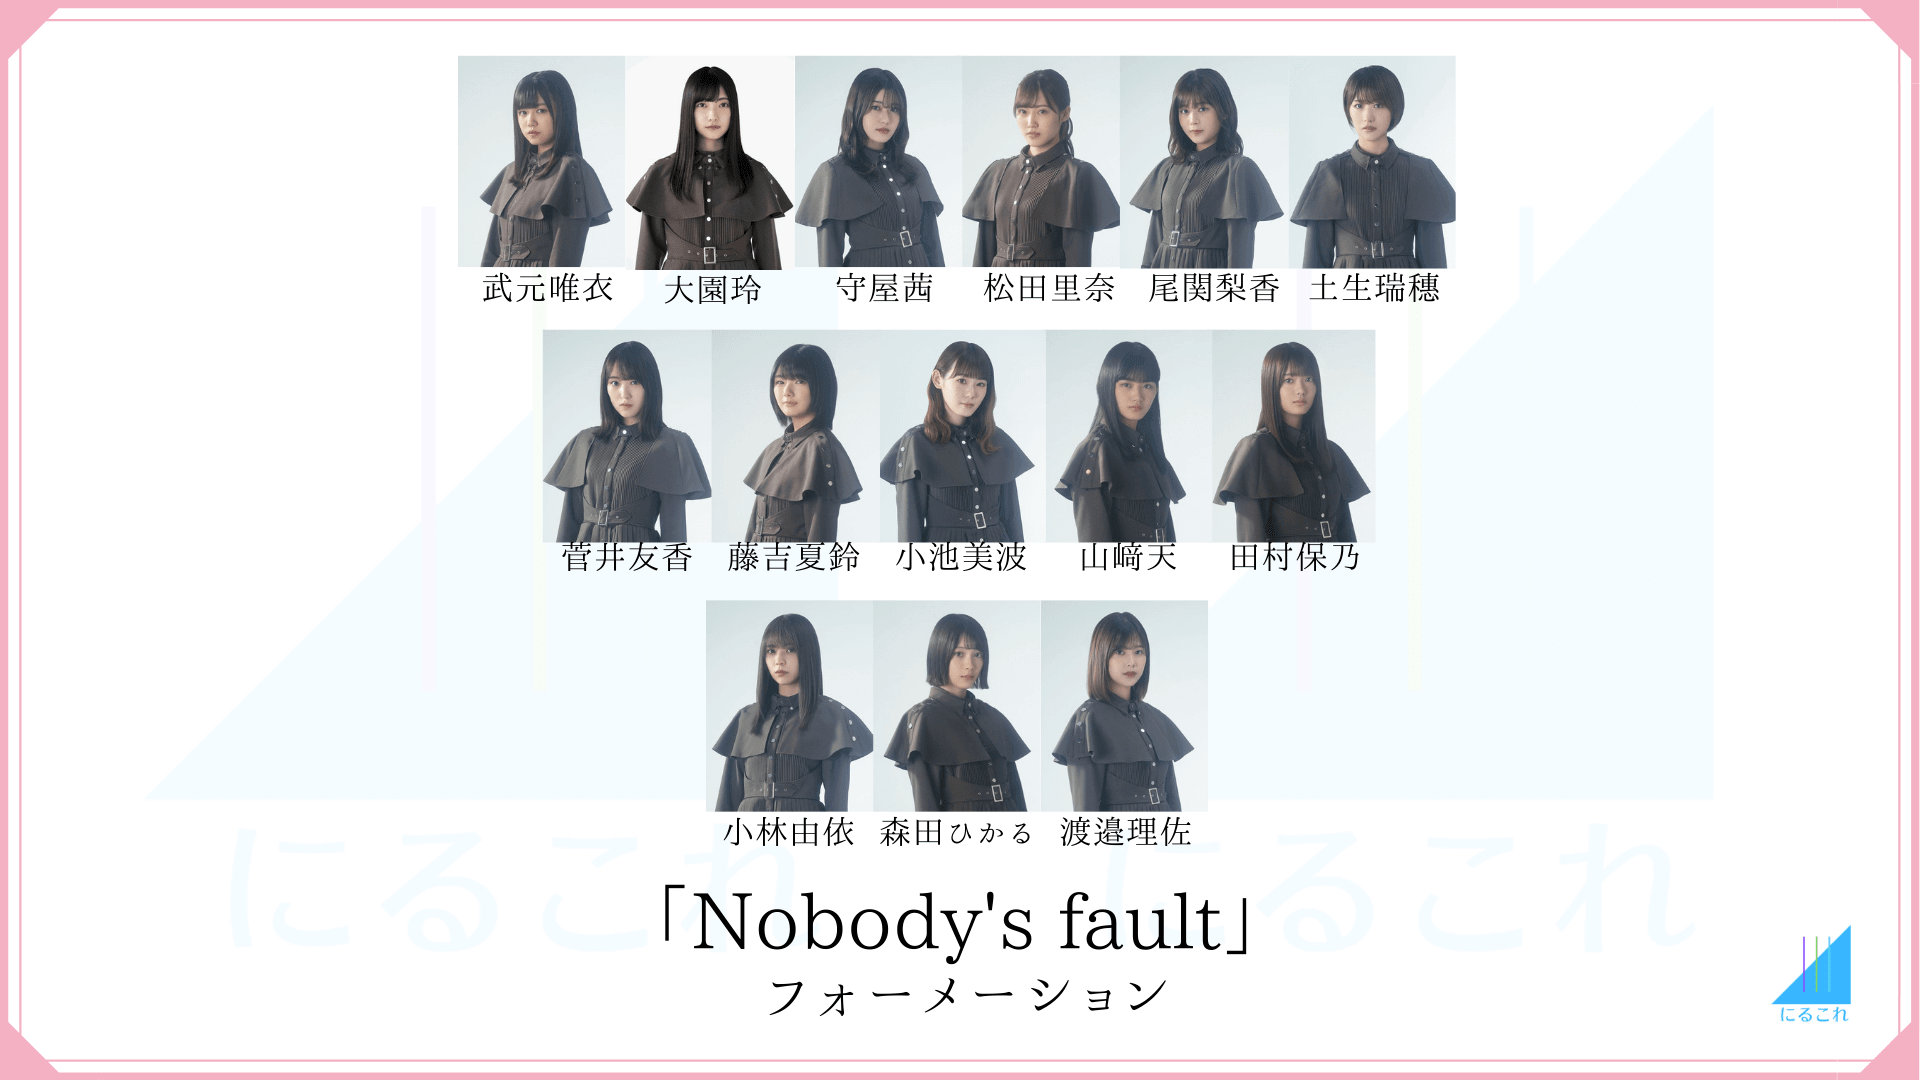 Nobody's faultのフォーメーション画像